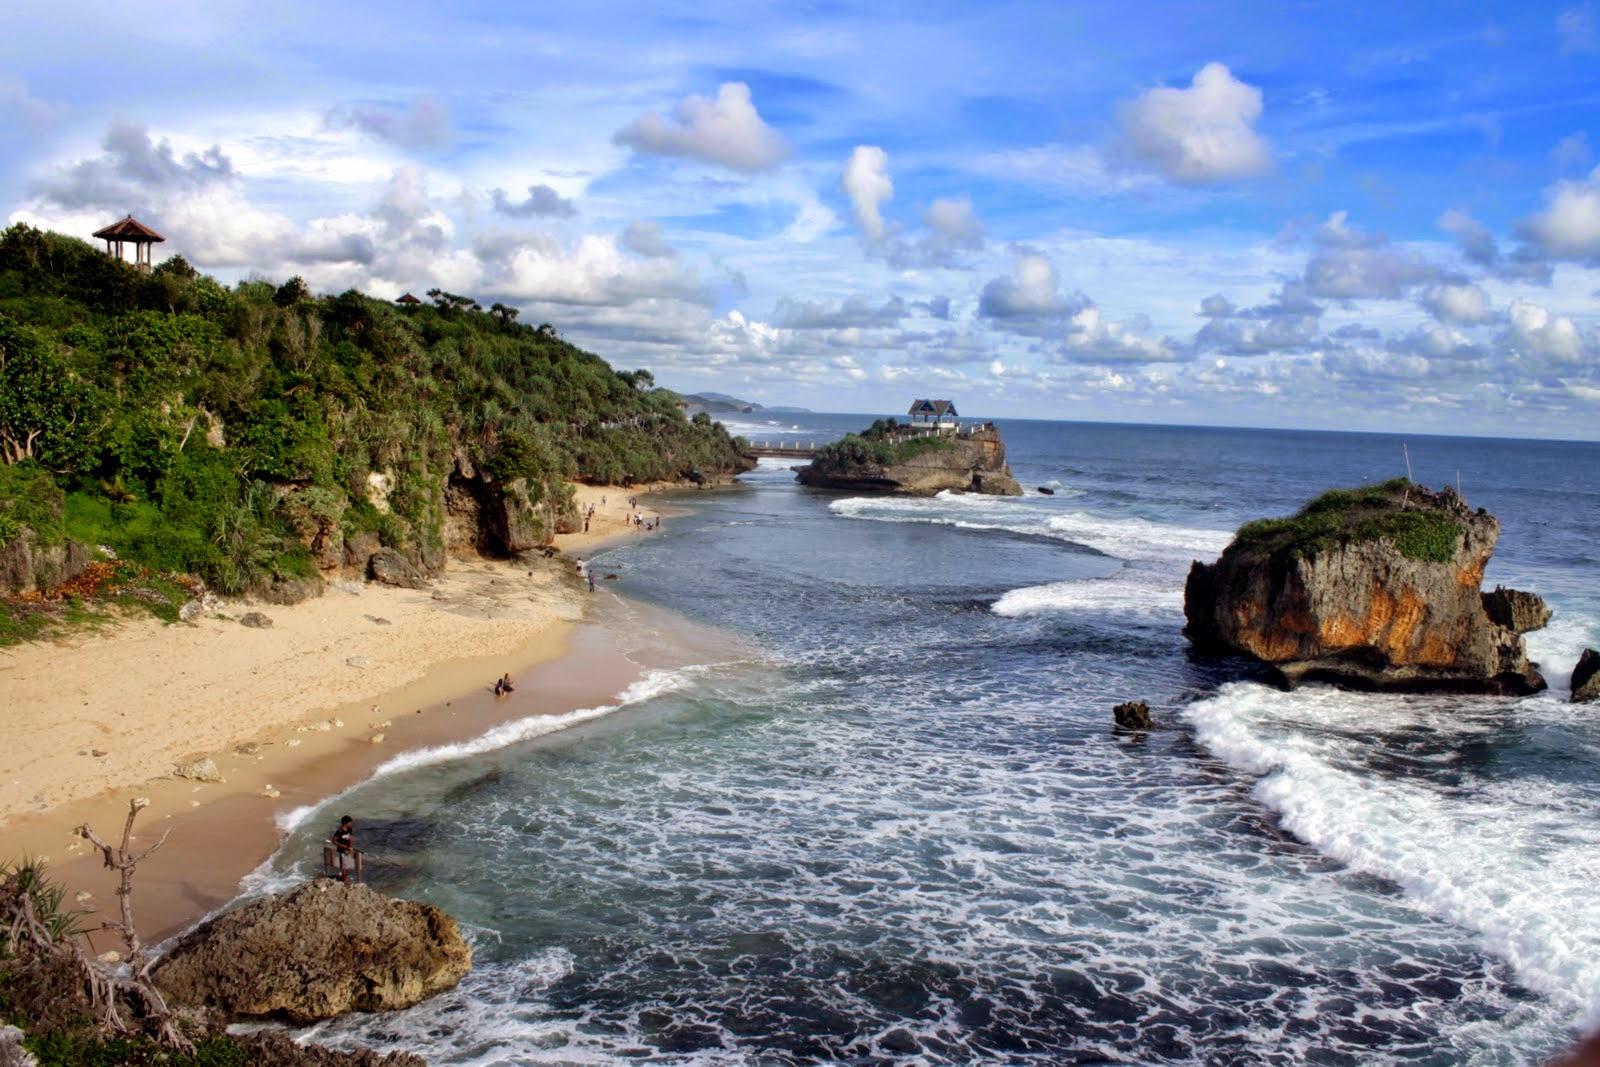 19 Tempat Wisata Pantai Di Jogja Yang Indah Dan Cantik